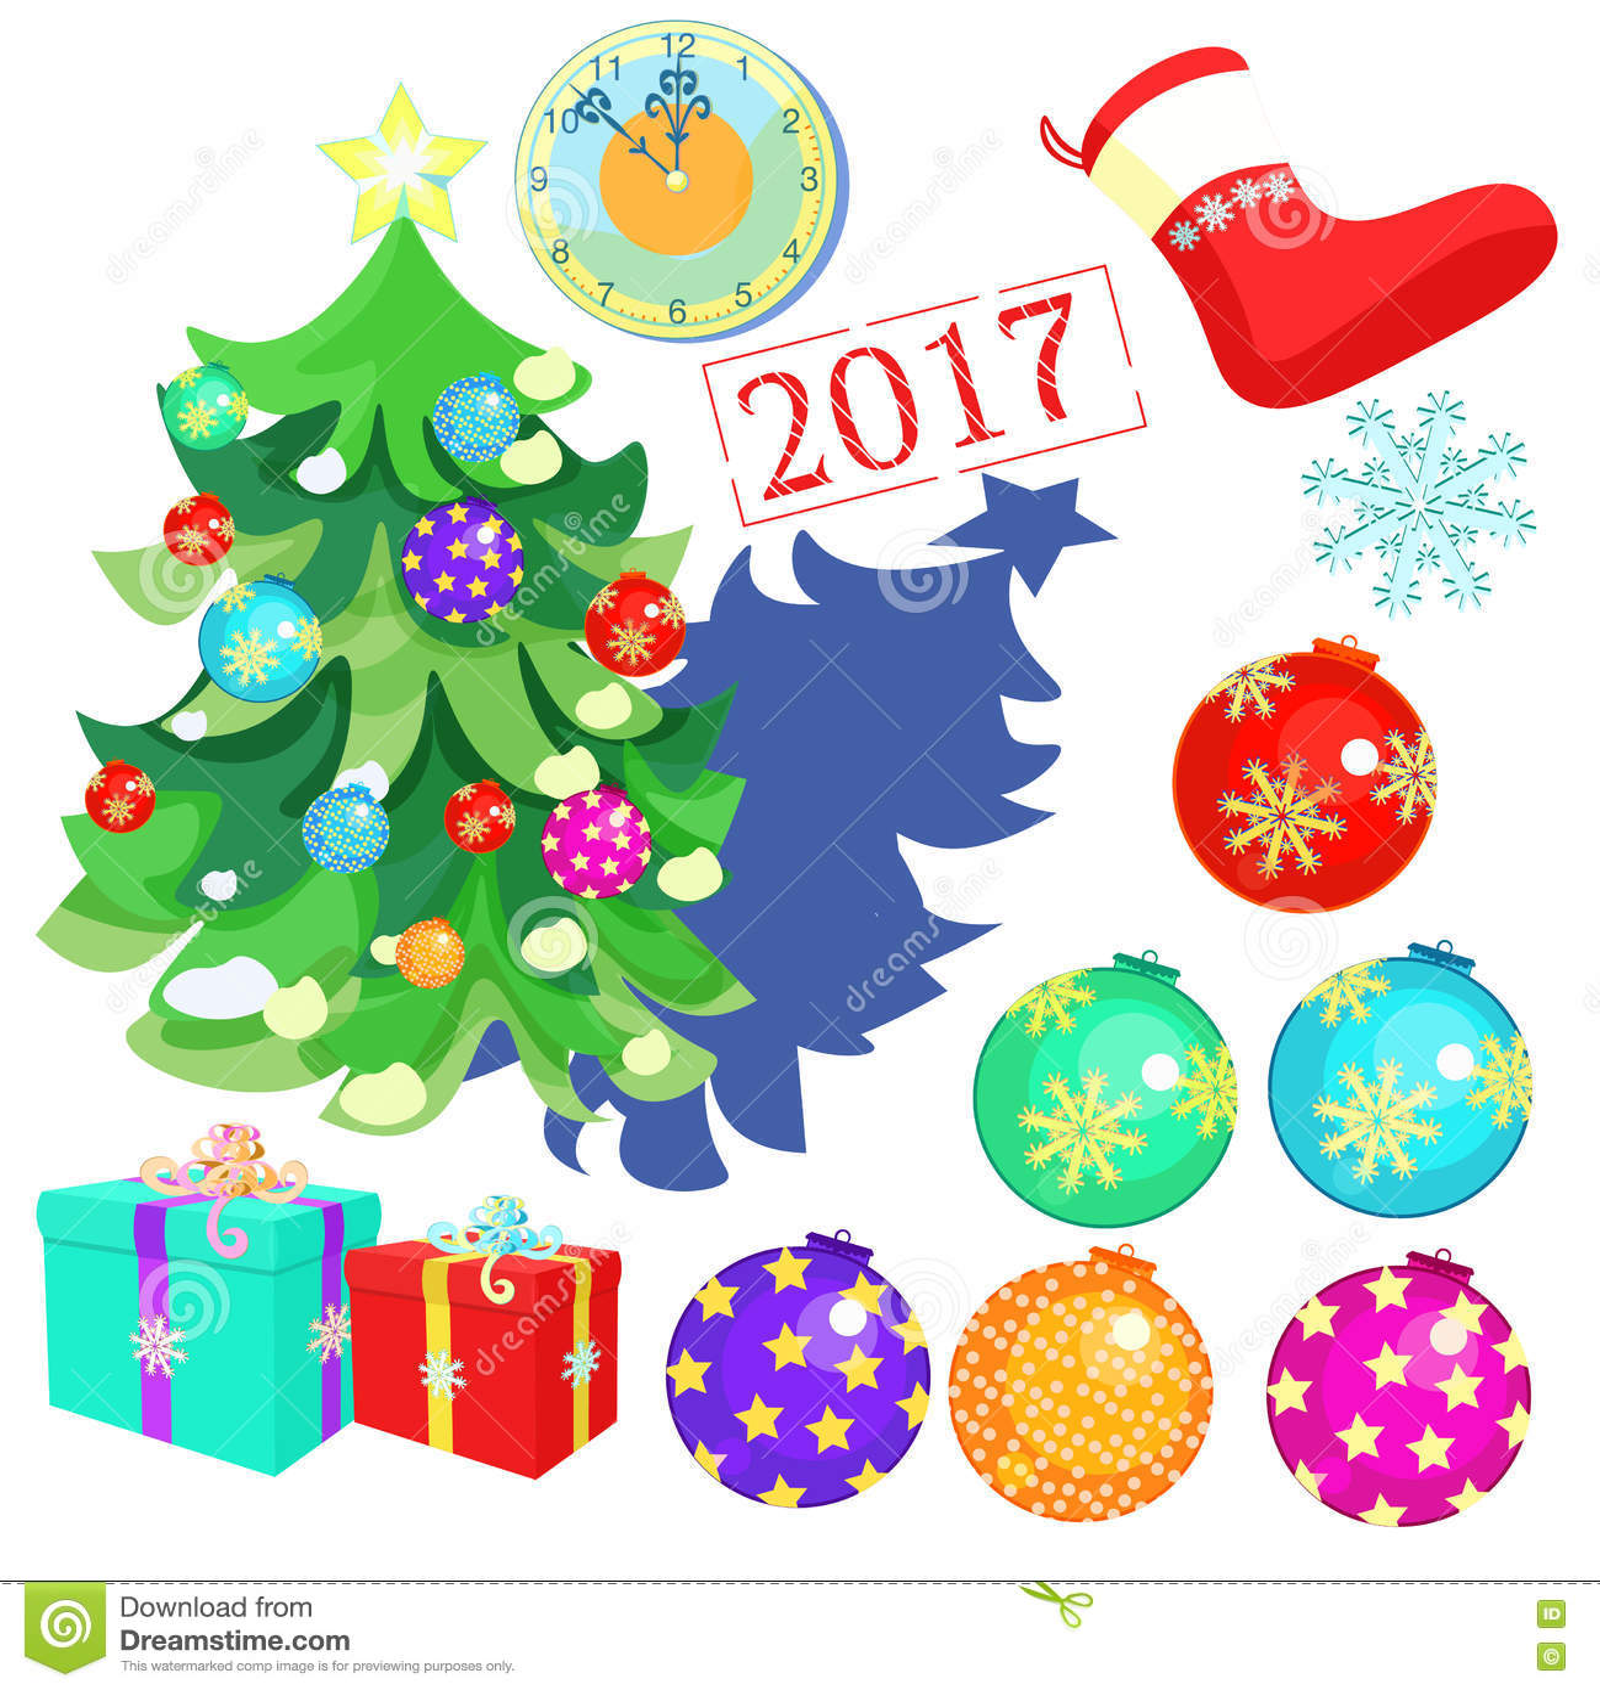 Set Of Christmas Decorations Toys Balls Tree Clock Twelve Gifts Santa Claus Socks 2017 Vector Illustration